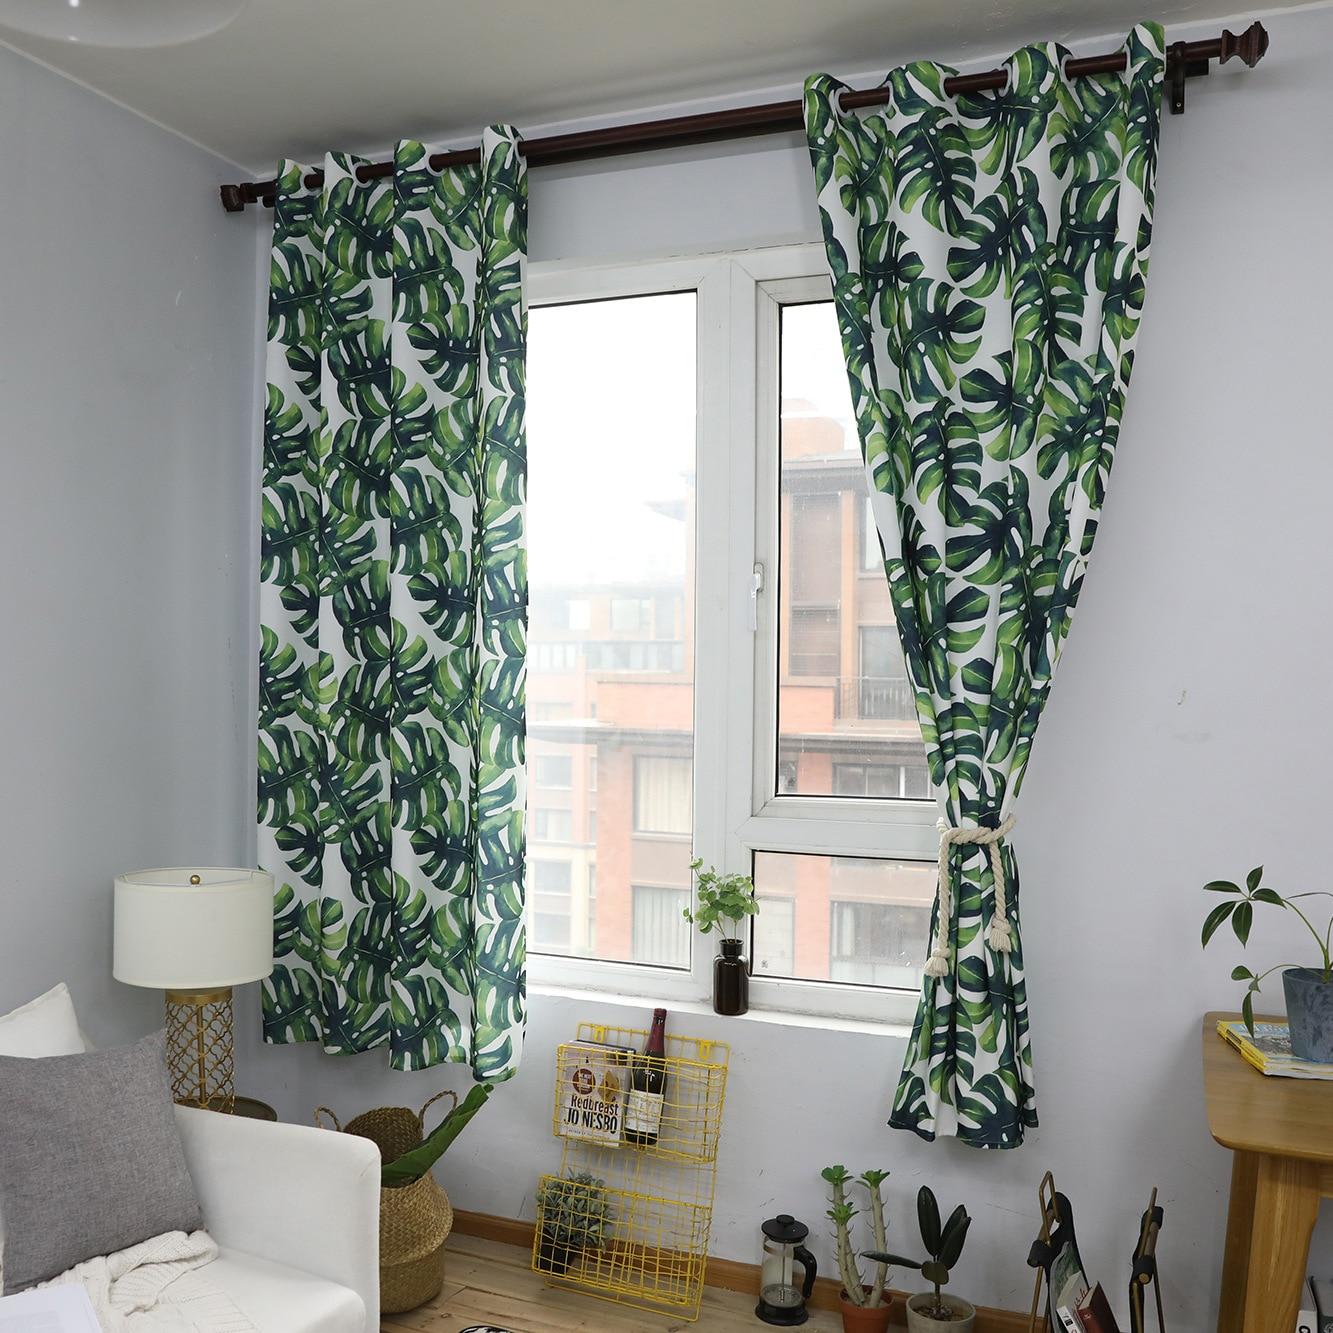 US $31.09 9% OFF Curtain Turtle Back Bamboo Scandinavian Floating Window  Ground Vegetable Curtain Living Room Curtain Green Corridor Waterproof-in  ...